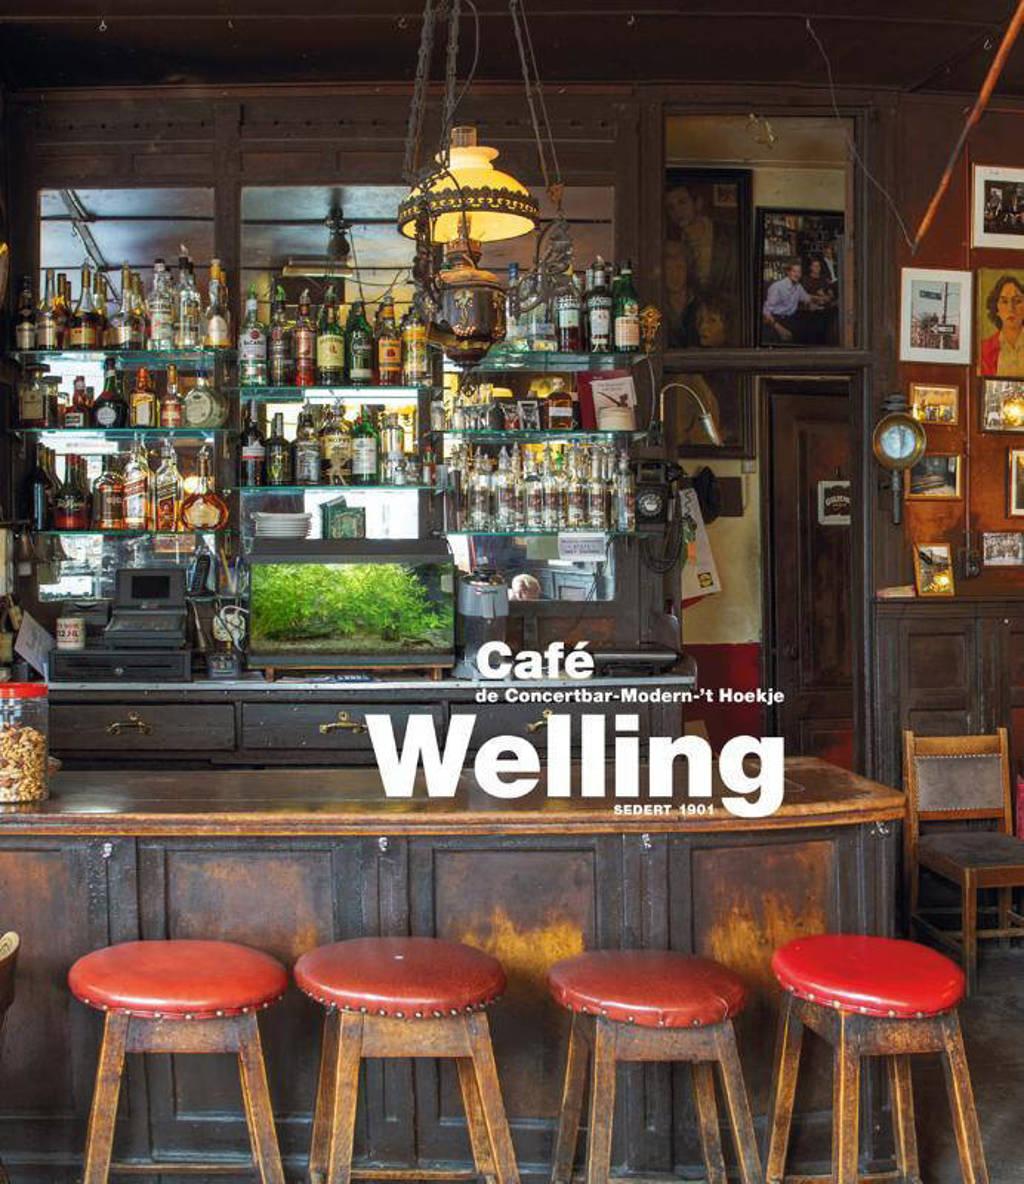 Café Welling - Jan Haasbroek